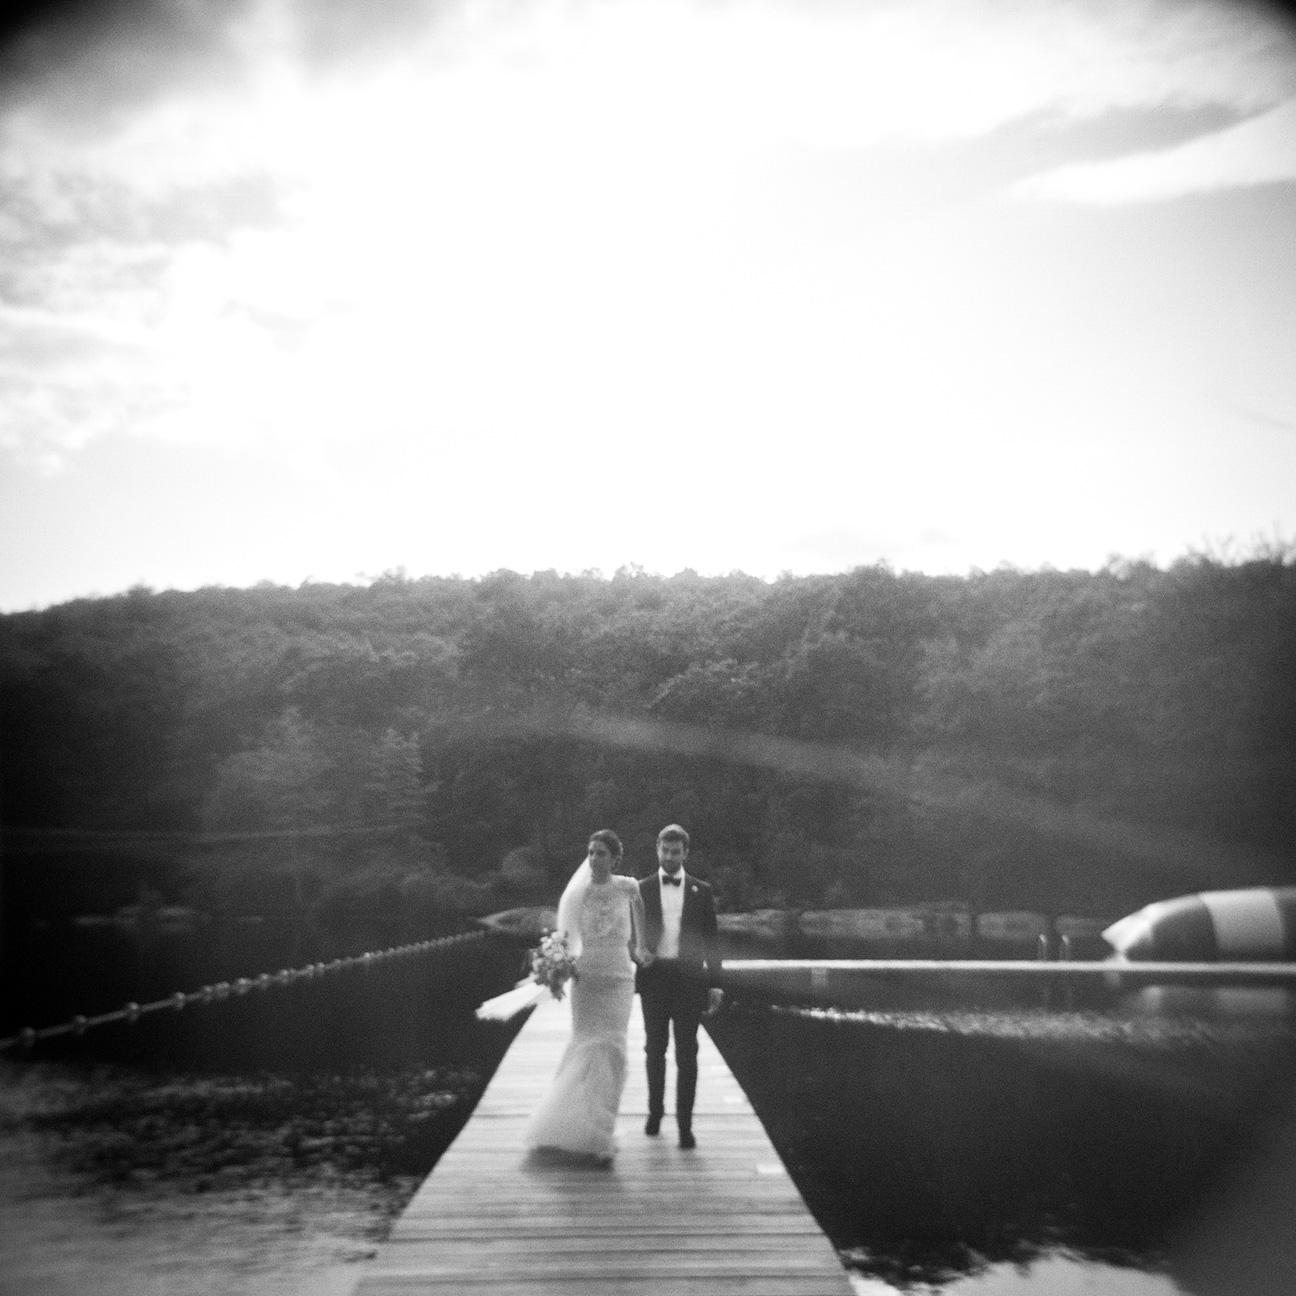 KarenHillPhotography-Parizat-Wedding-0315.jpg